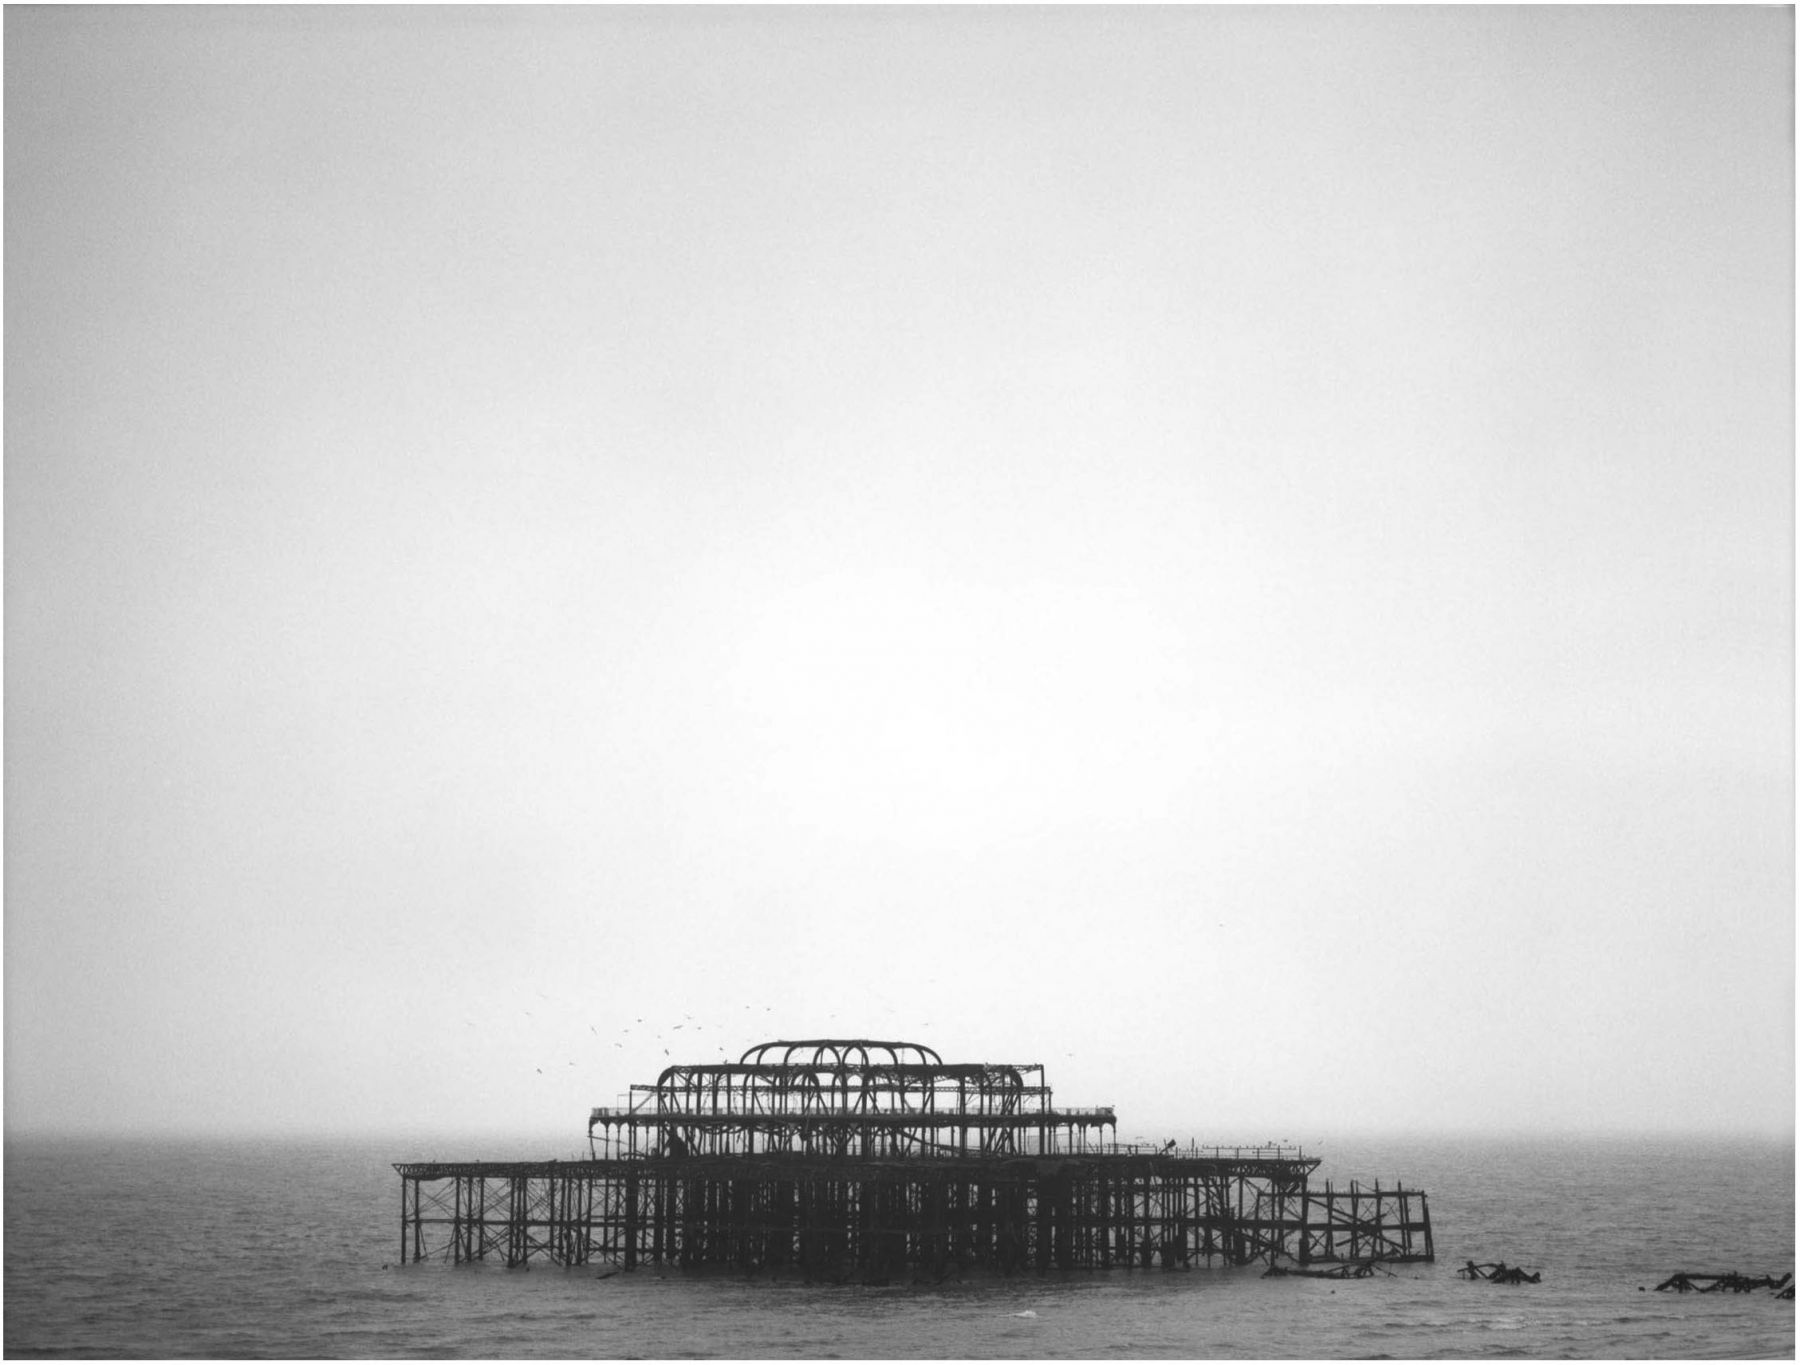 West Pier I